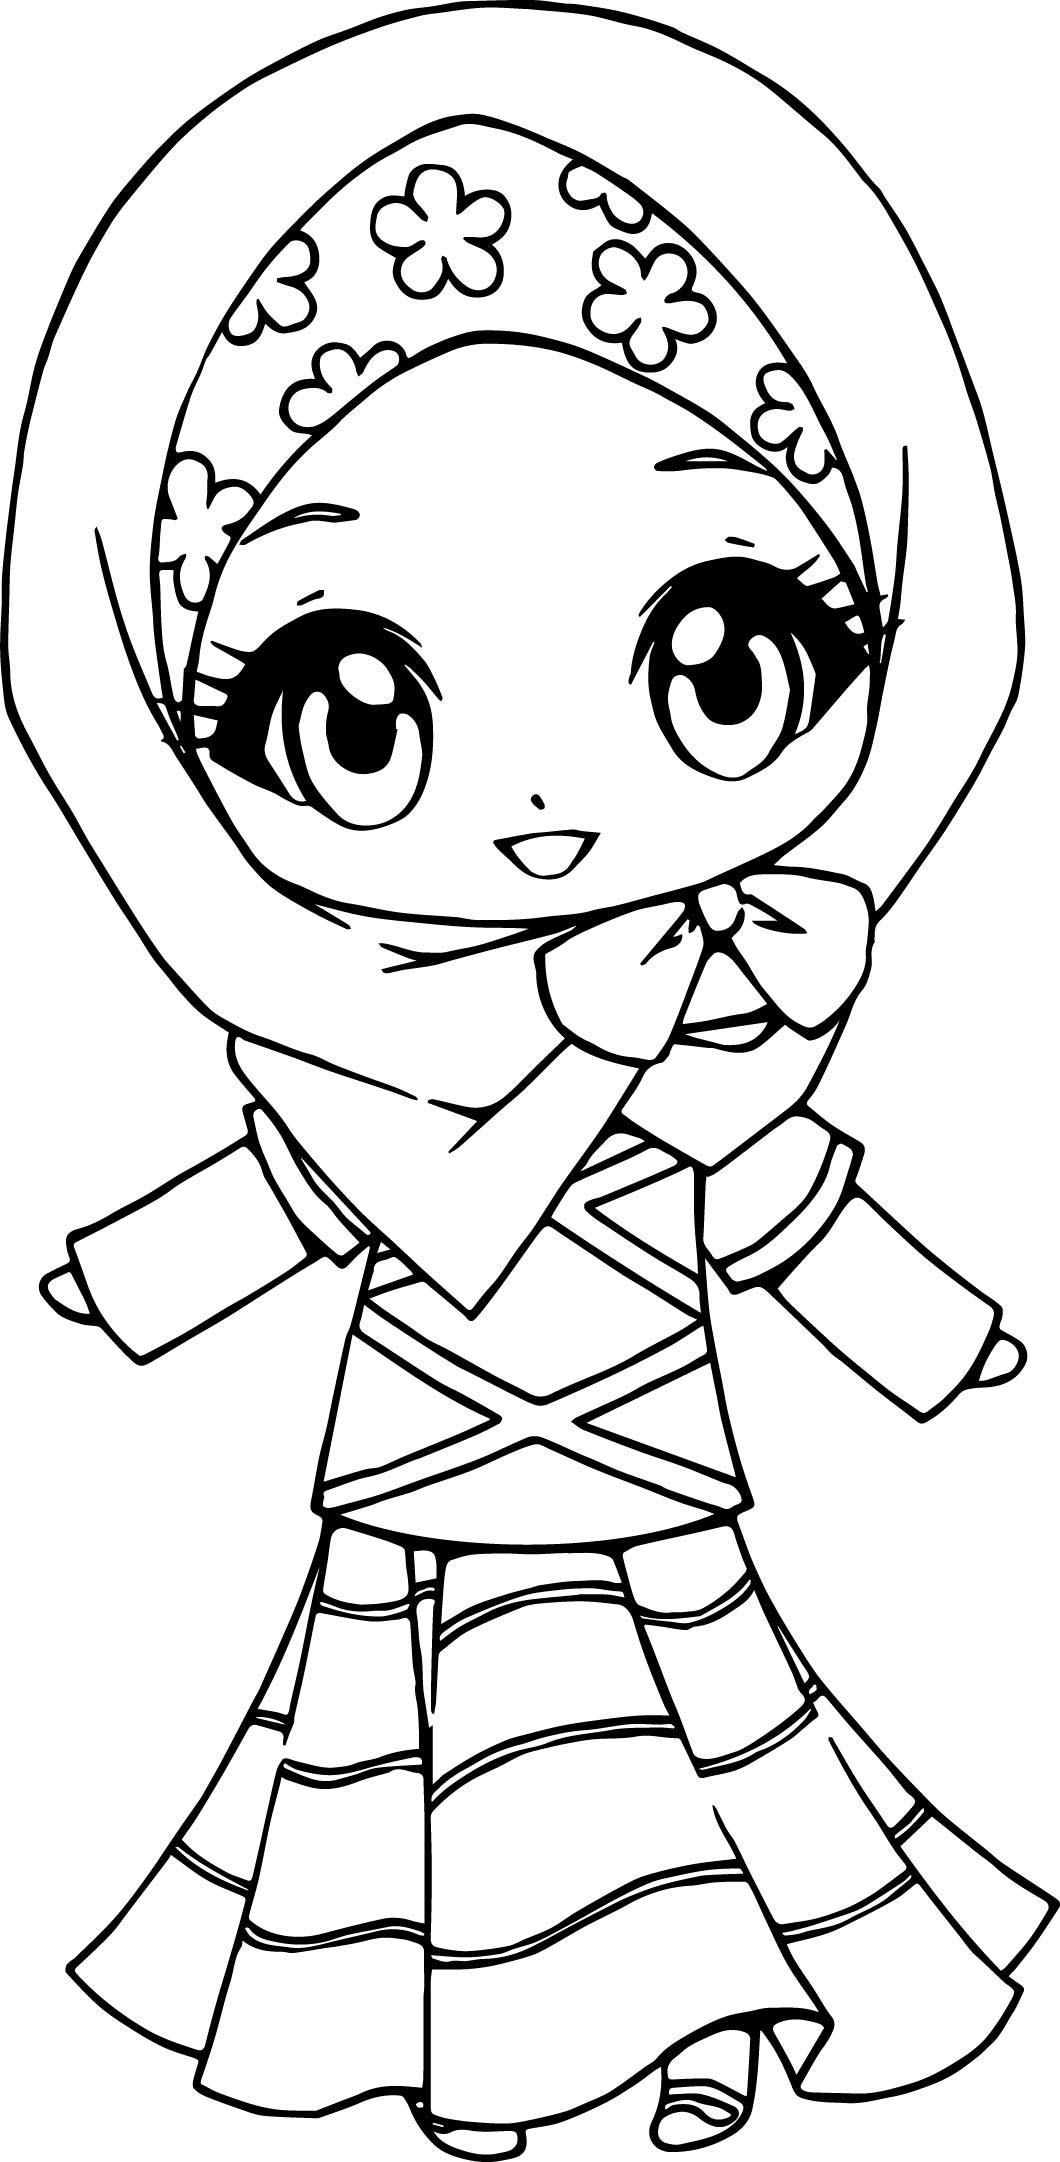 1060x2162 Muslim Anime Girl Coloring Page Wecoloringpage